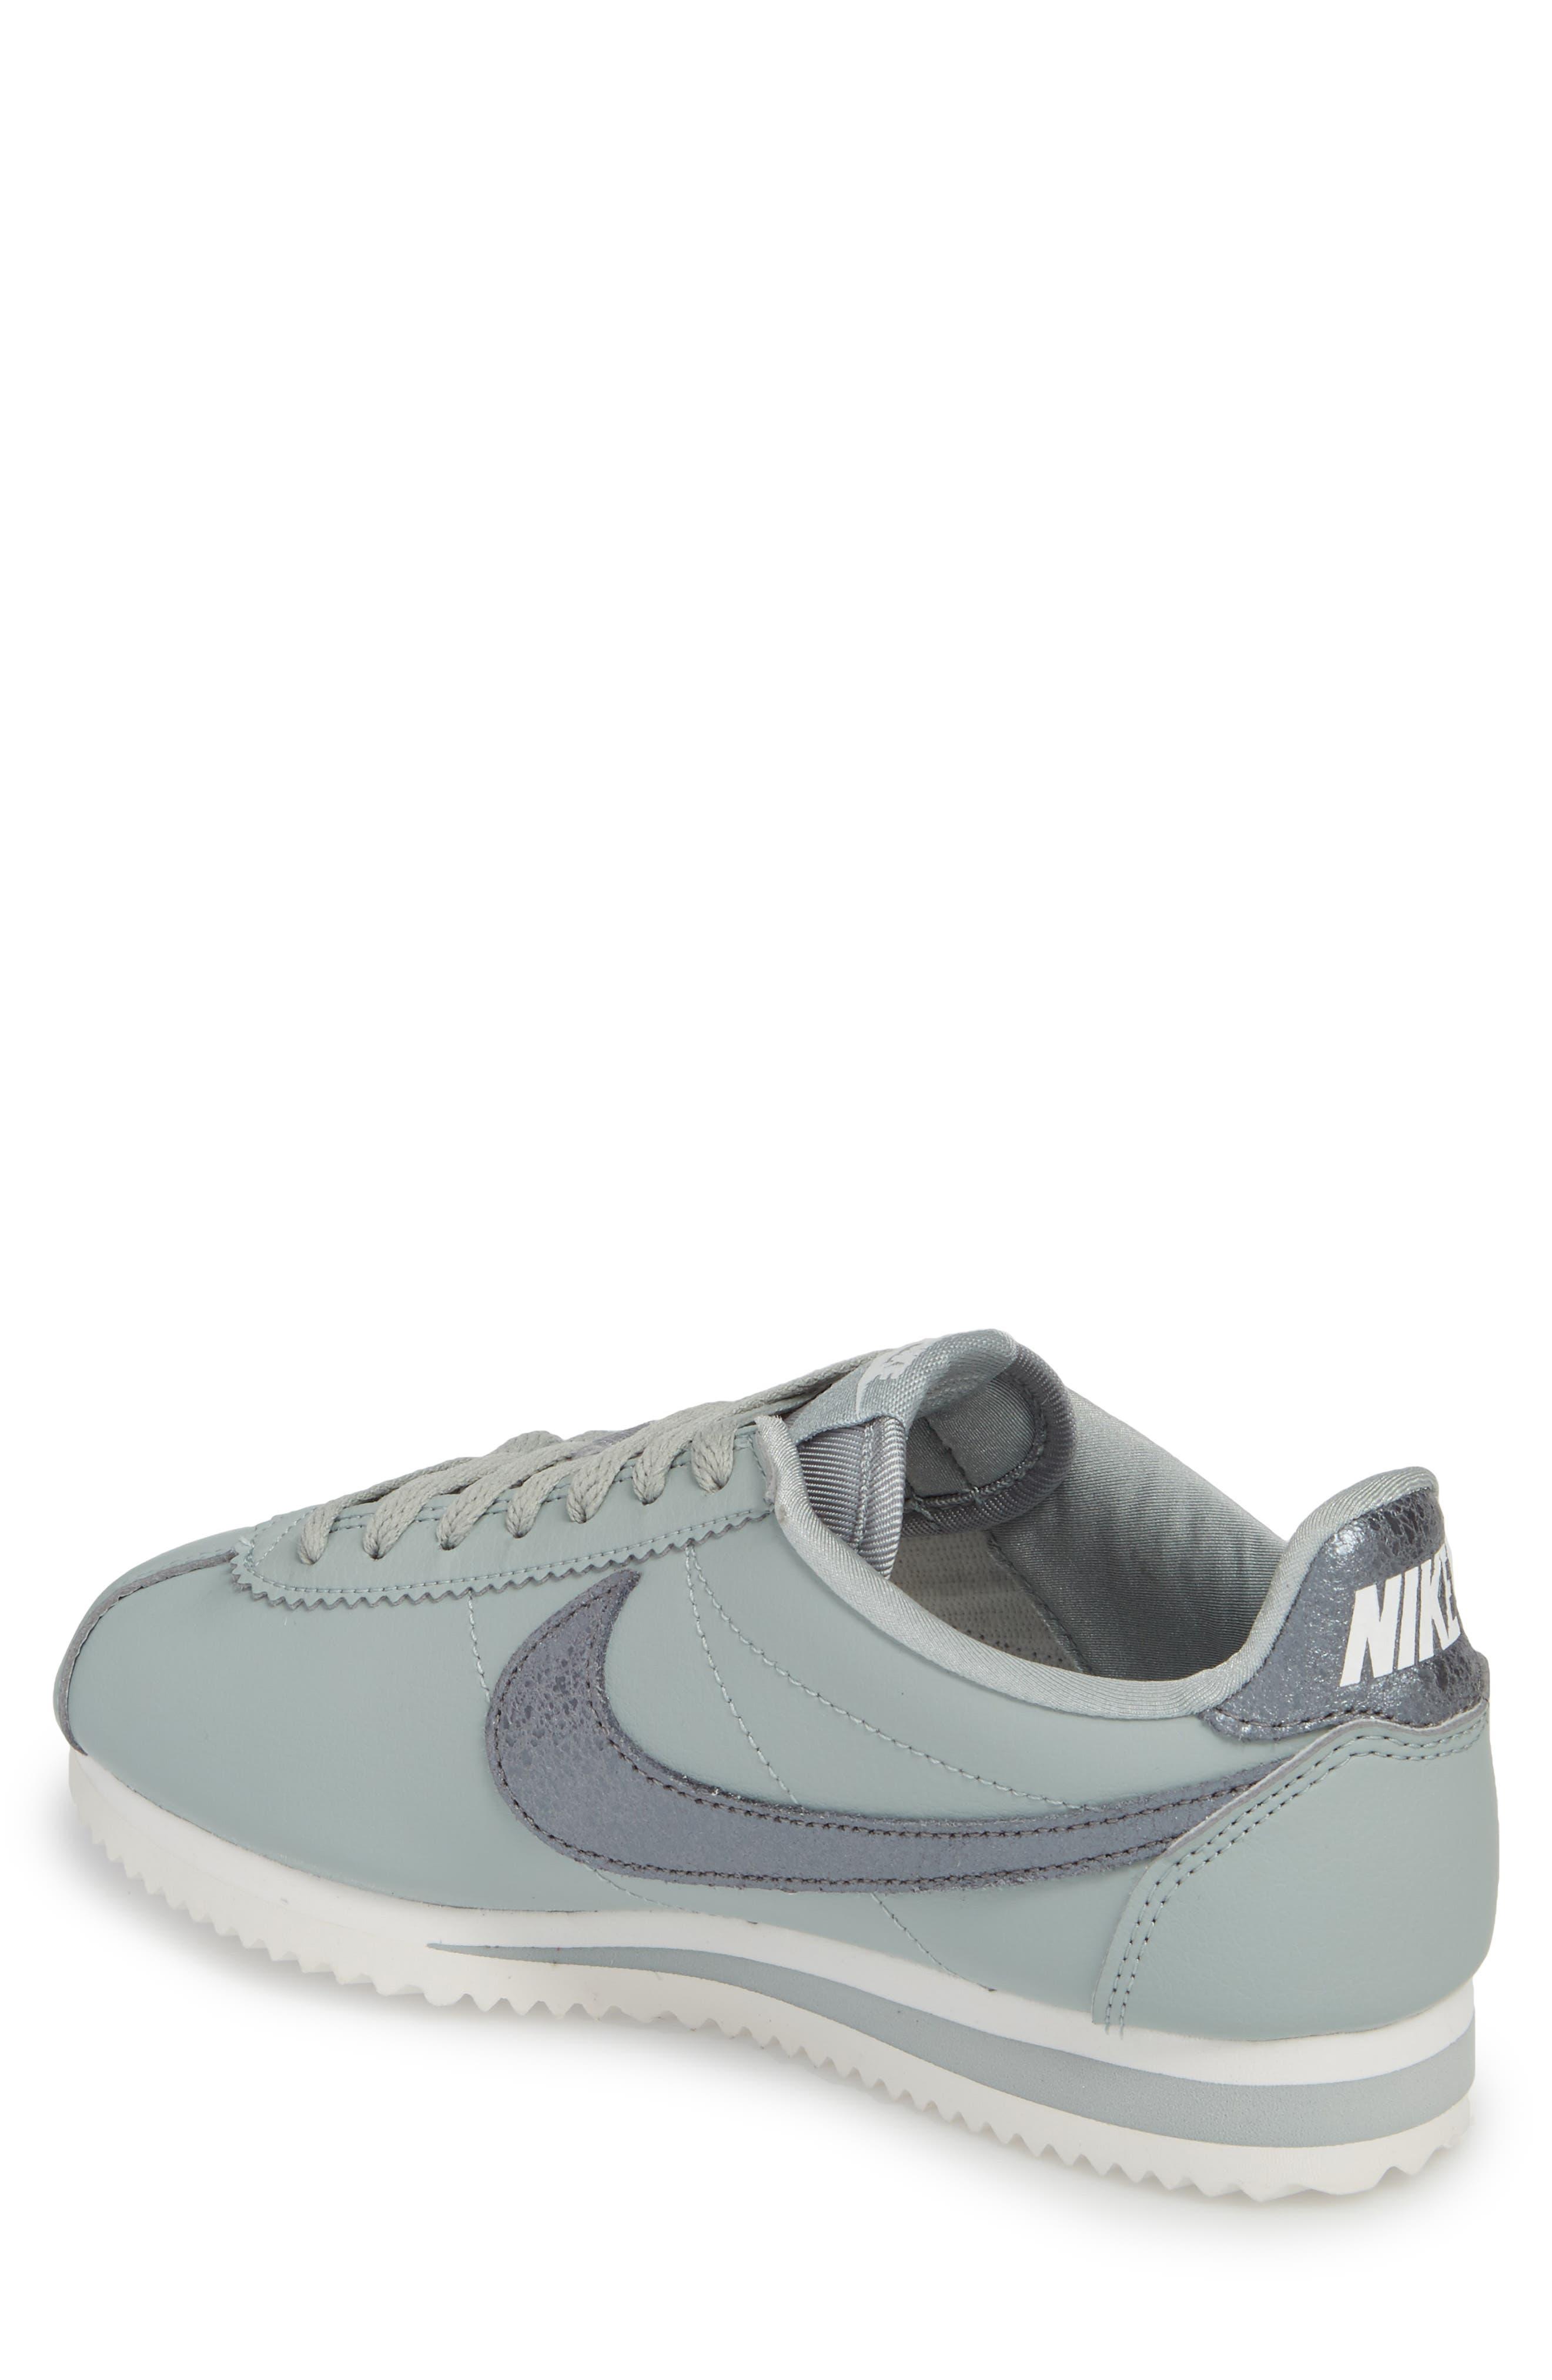 Classic Cortez Premium Sneaker,                             Alternate thumbnail 2, color,                             028